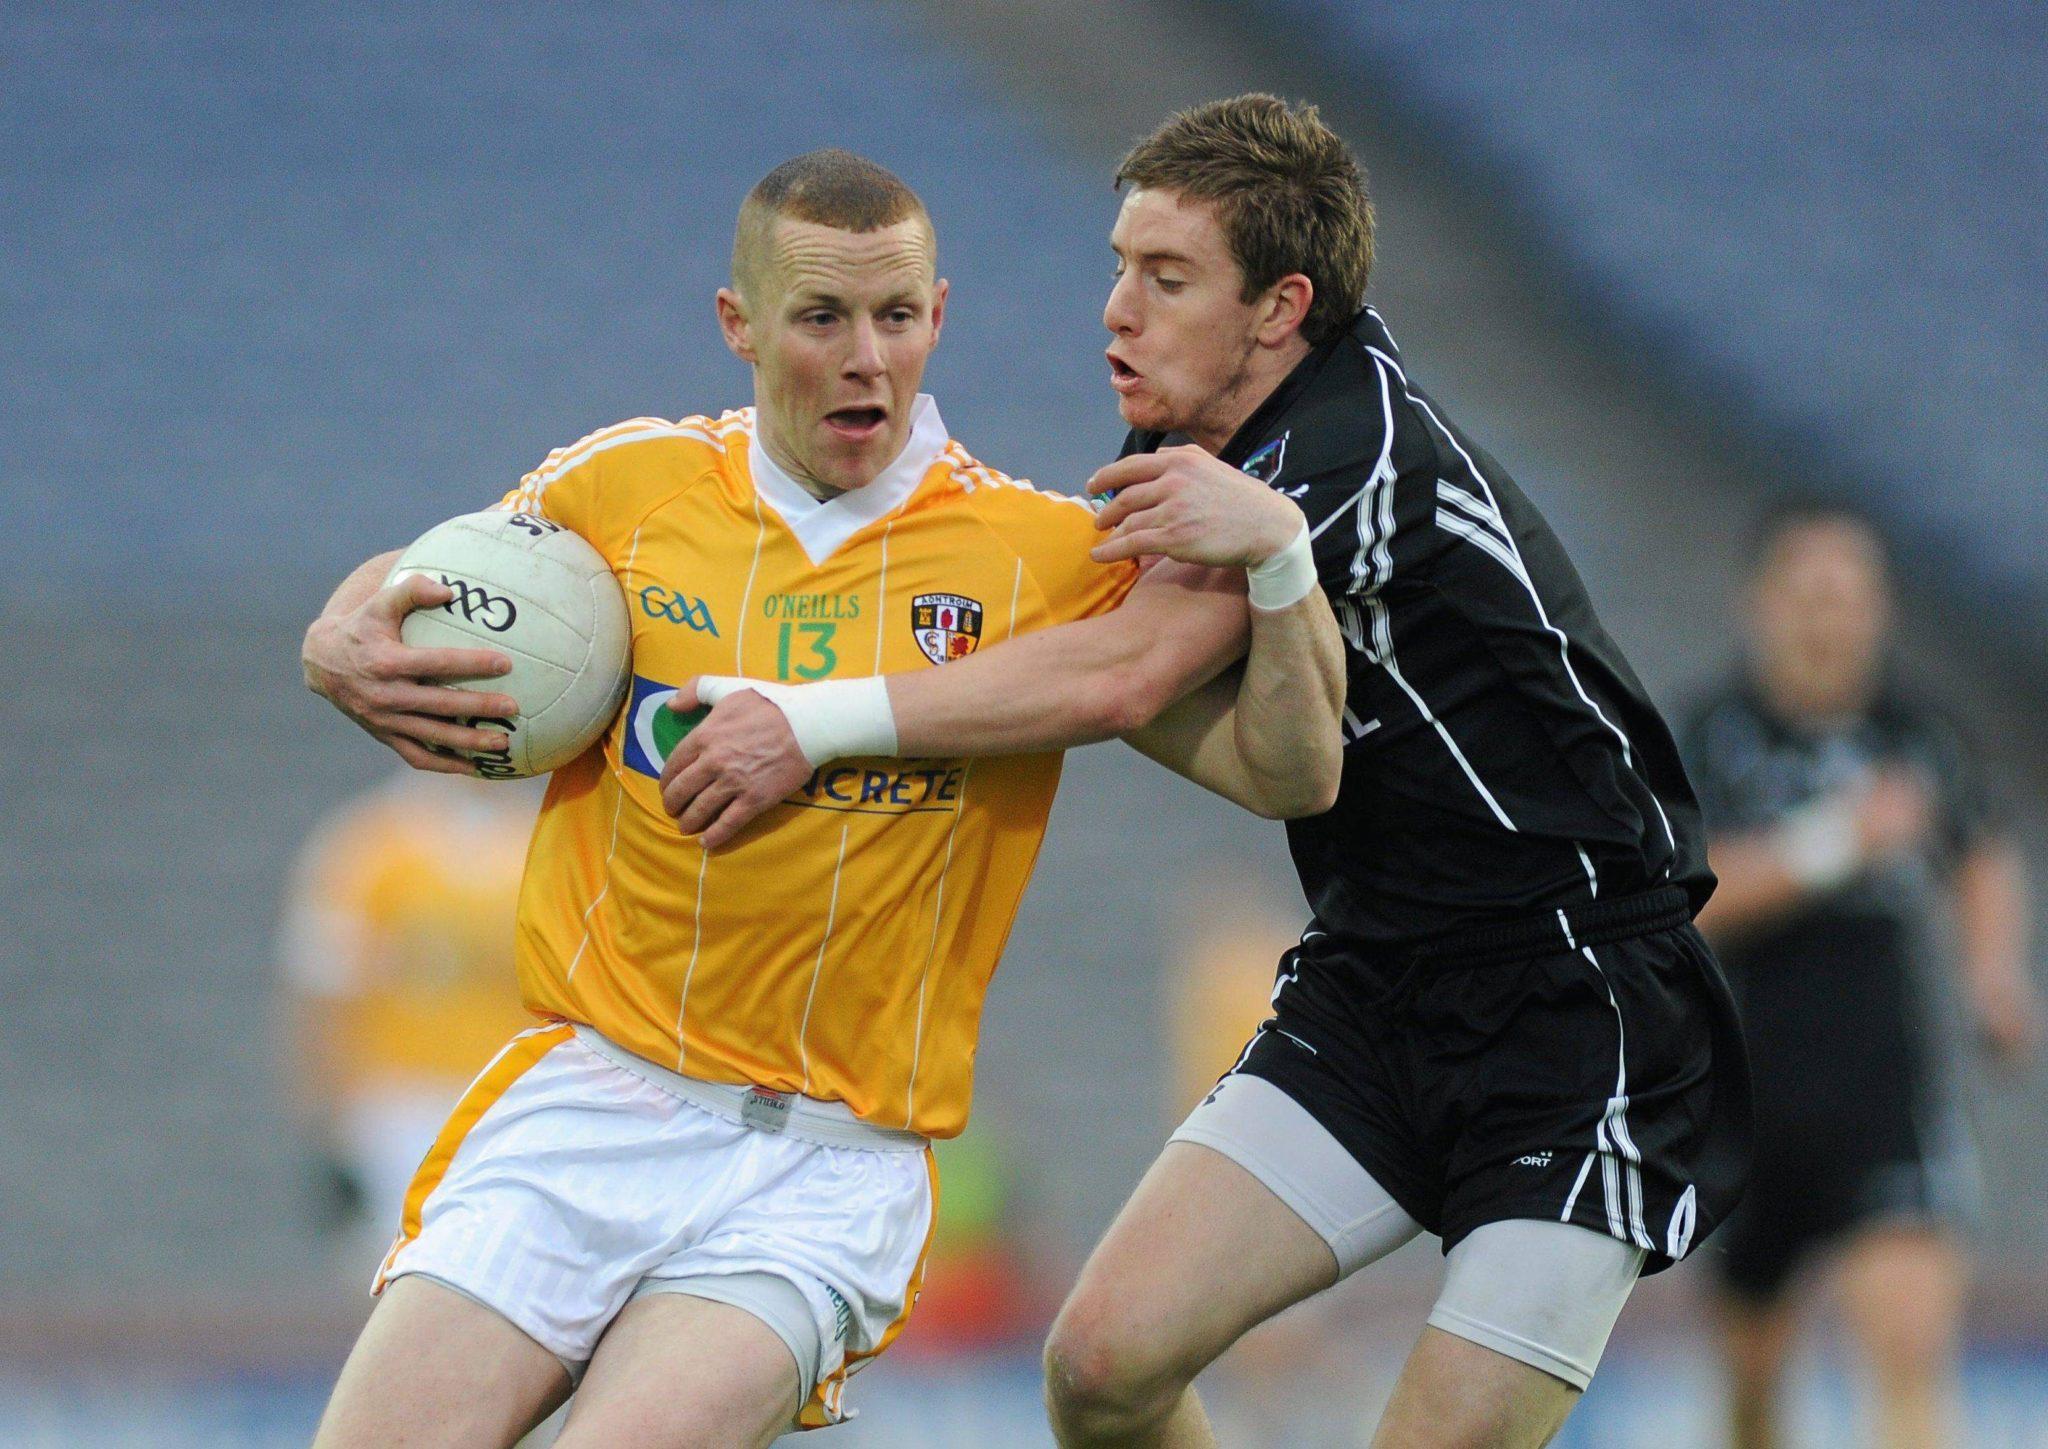 Paddy Cunningham